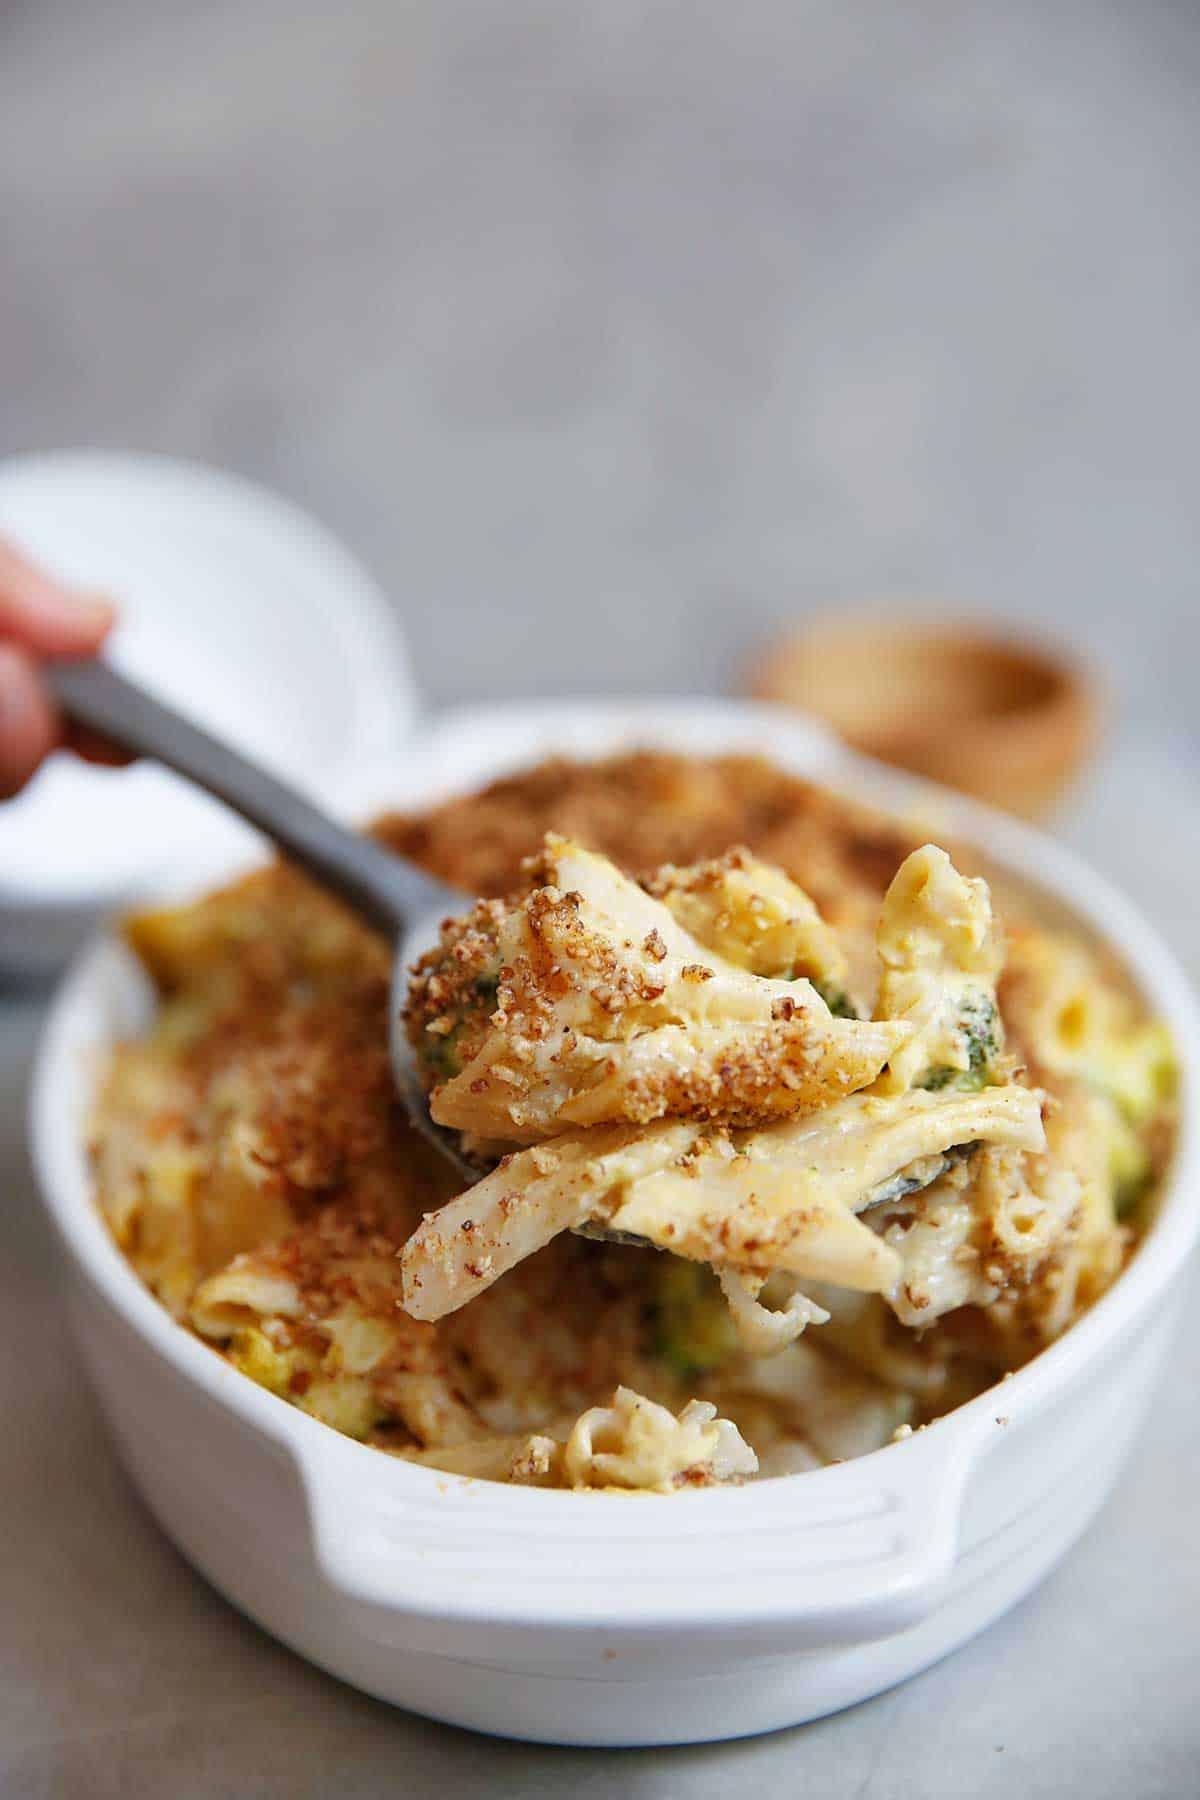 Sneaky Veggie Gluten-Free Mac and Cheese-Pecan Breadcrumbs | Lexi's Clean Kitchen